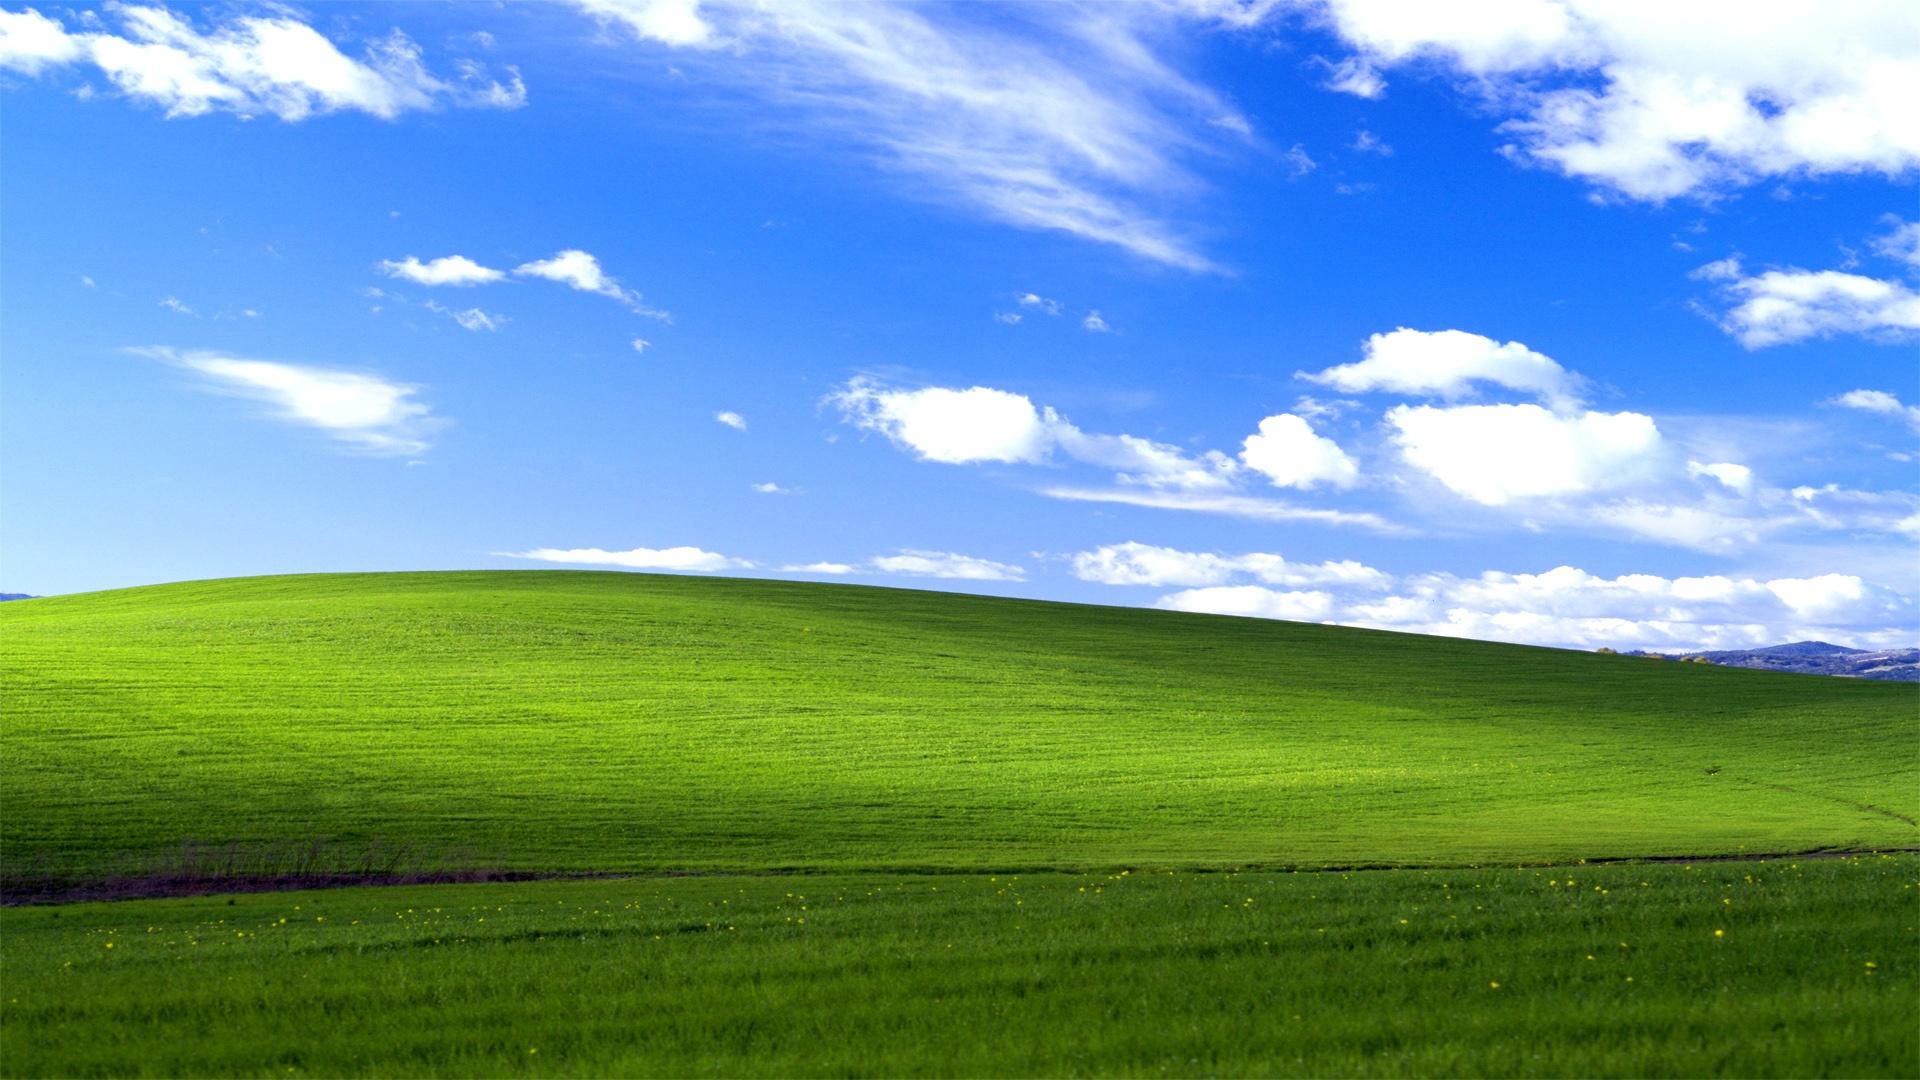 windows_xp_bliss-1488052-1920x1080